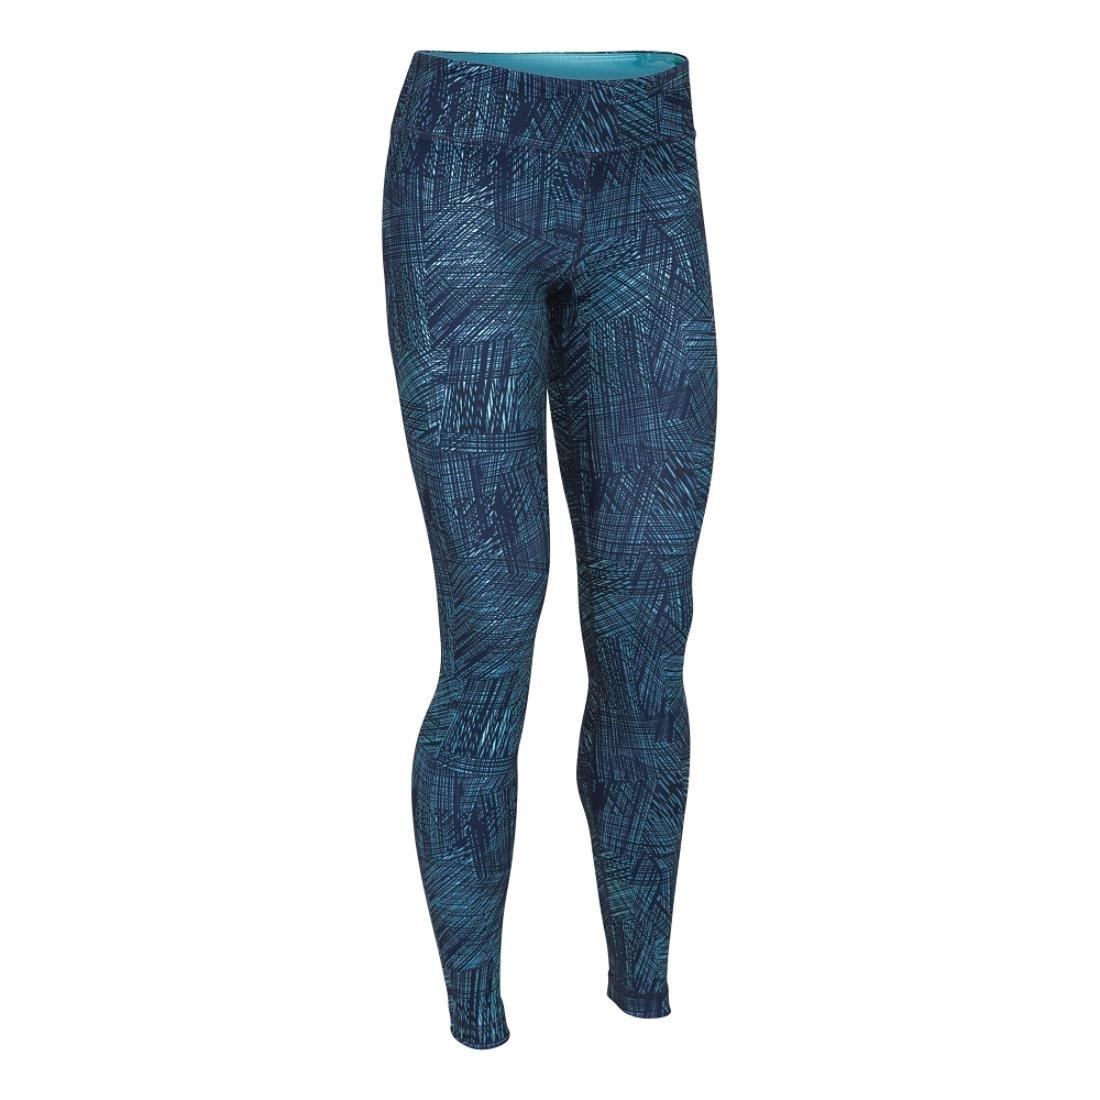 arrives c9c69 f0e40 Amazon.com  Under Armour Women s Ua Studio Printed Legging  Clothing